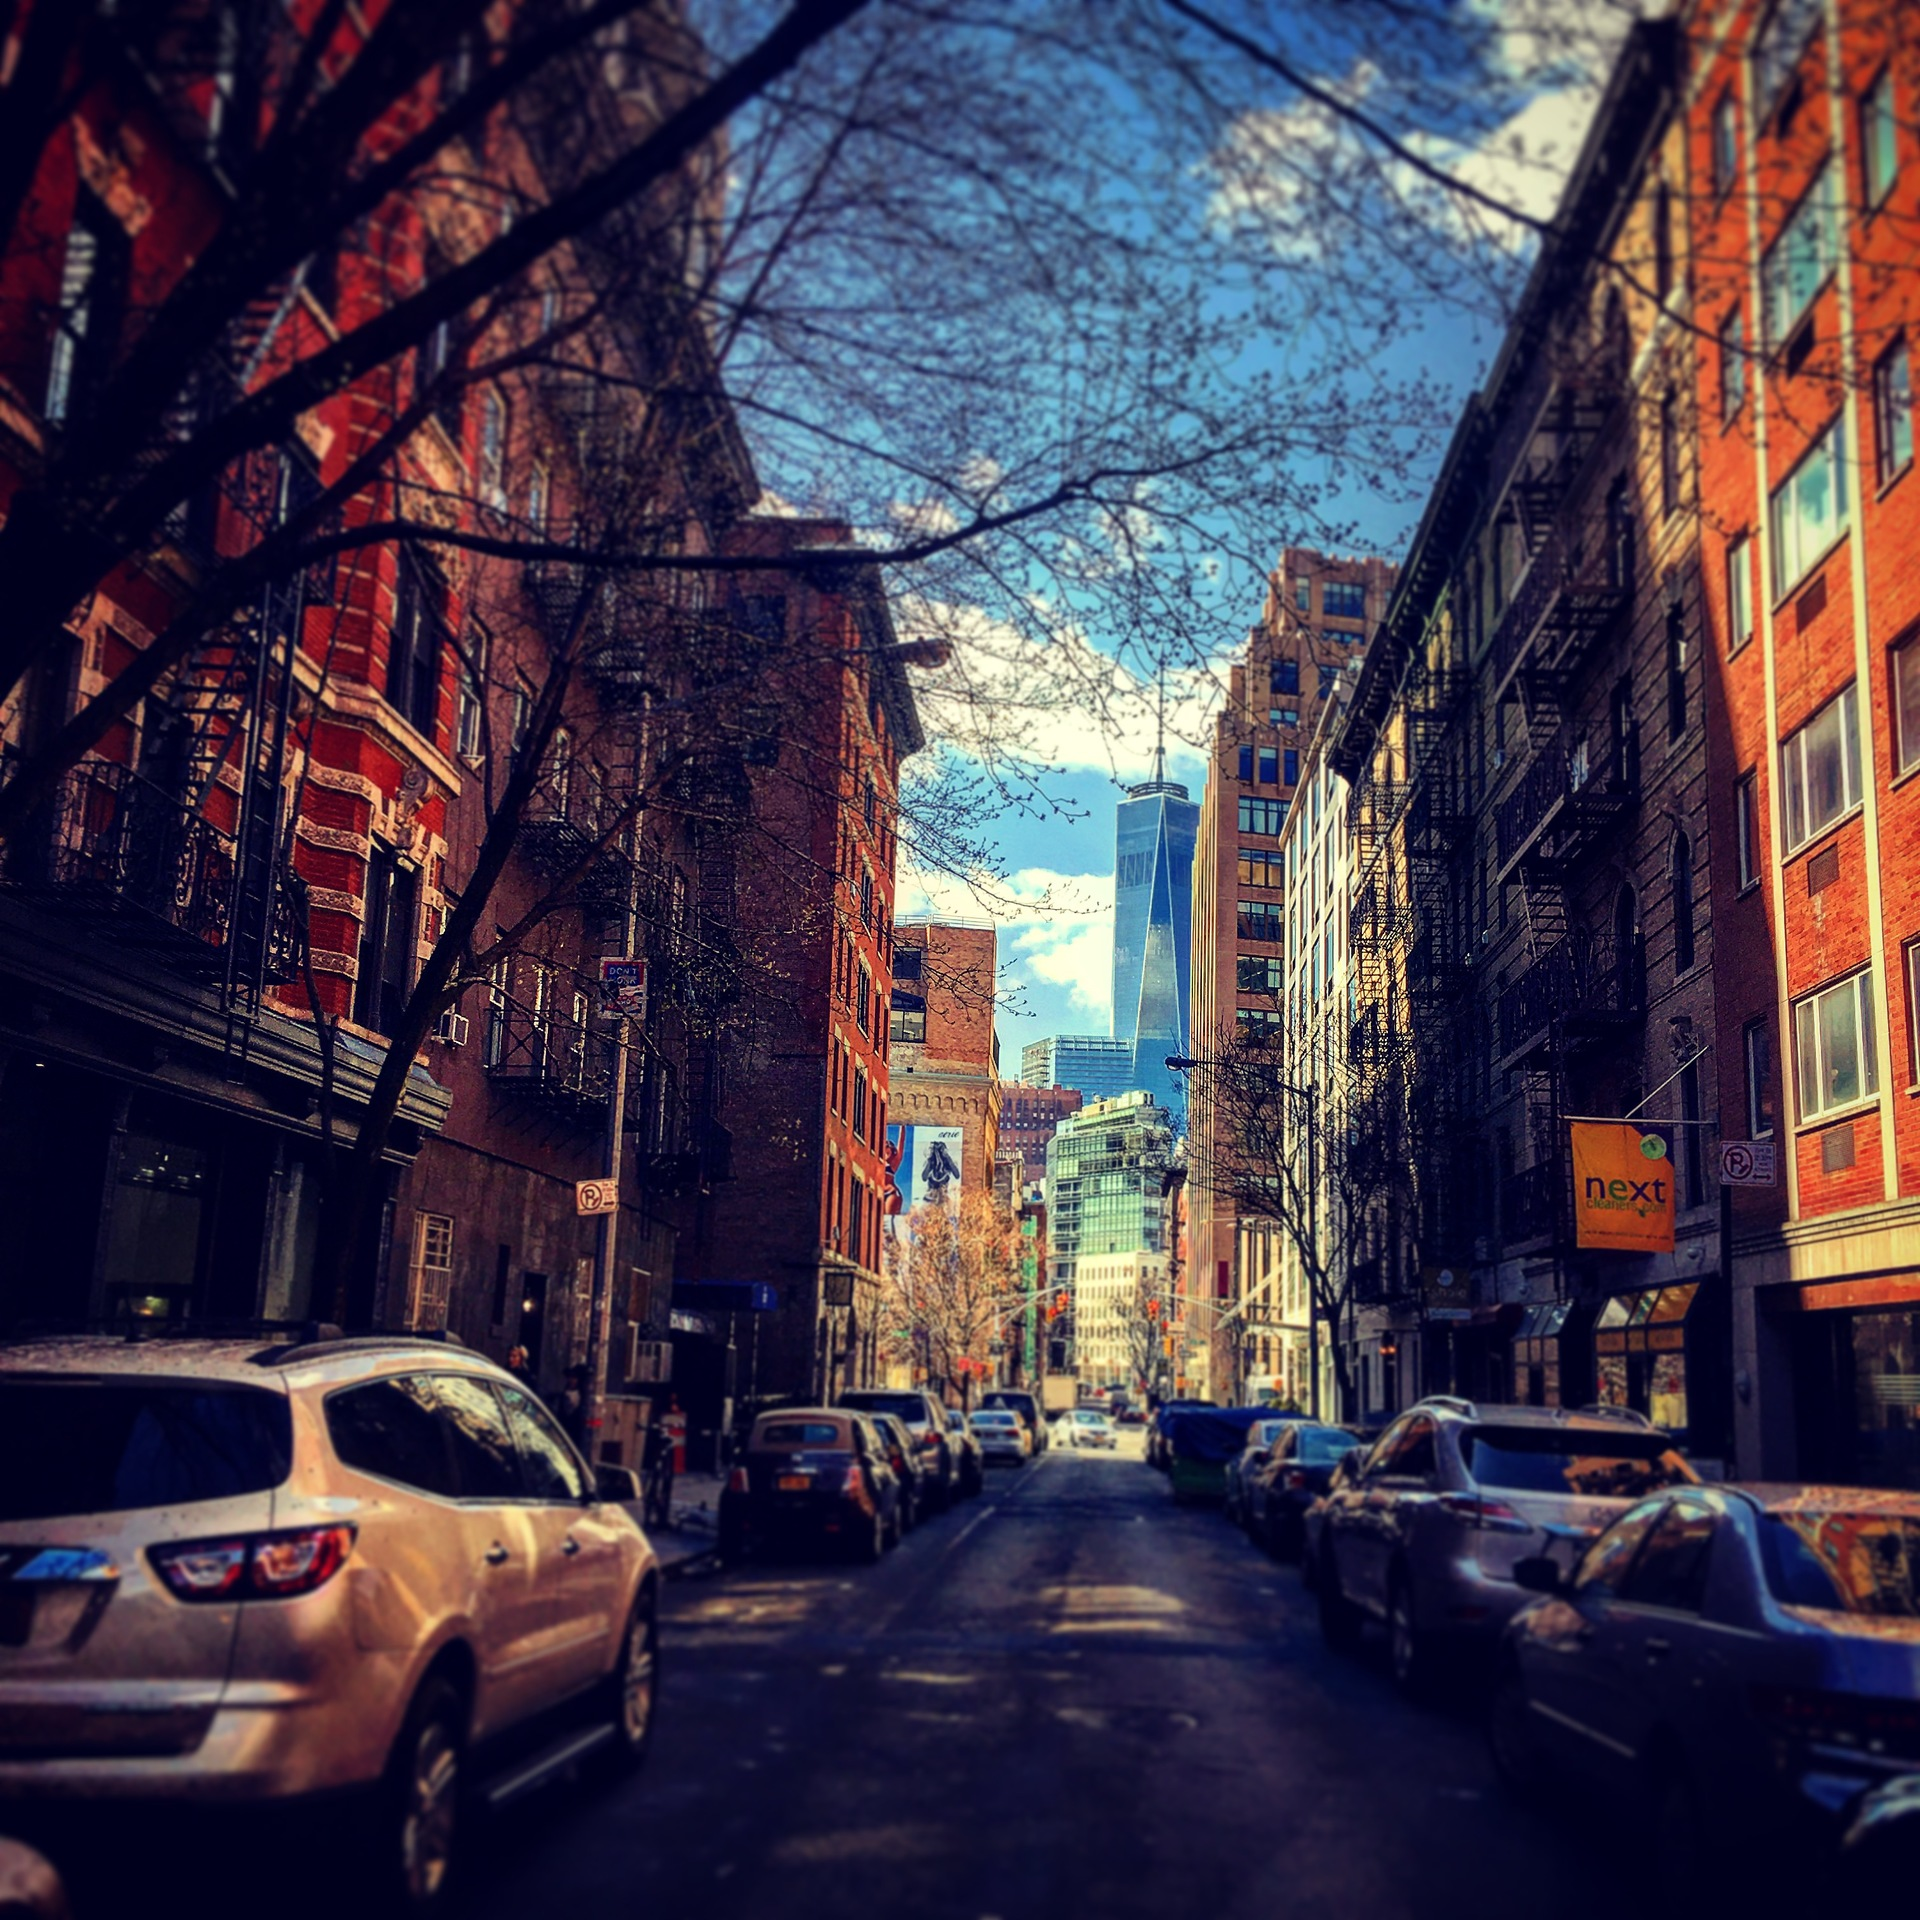 Street, Road, City, Urban, Light